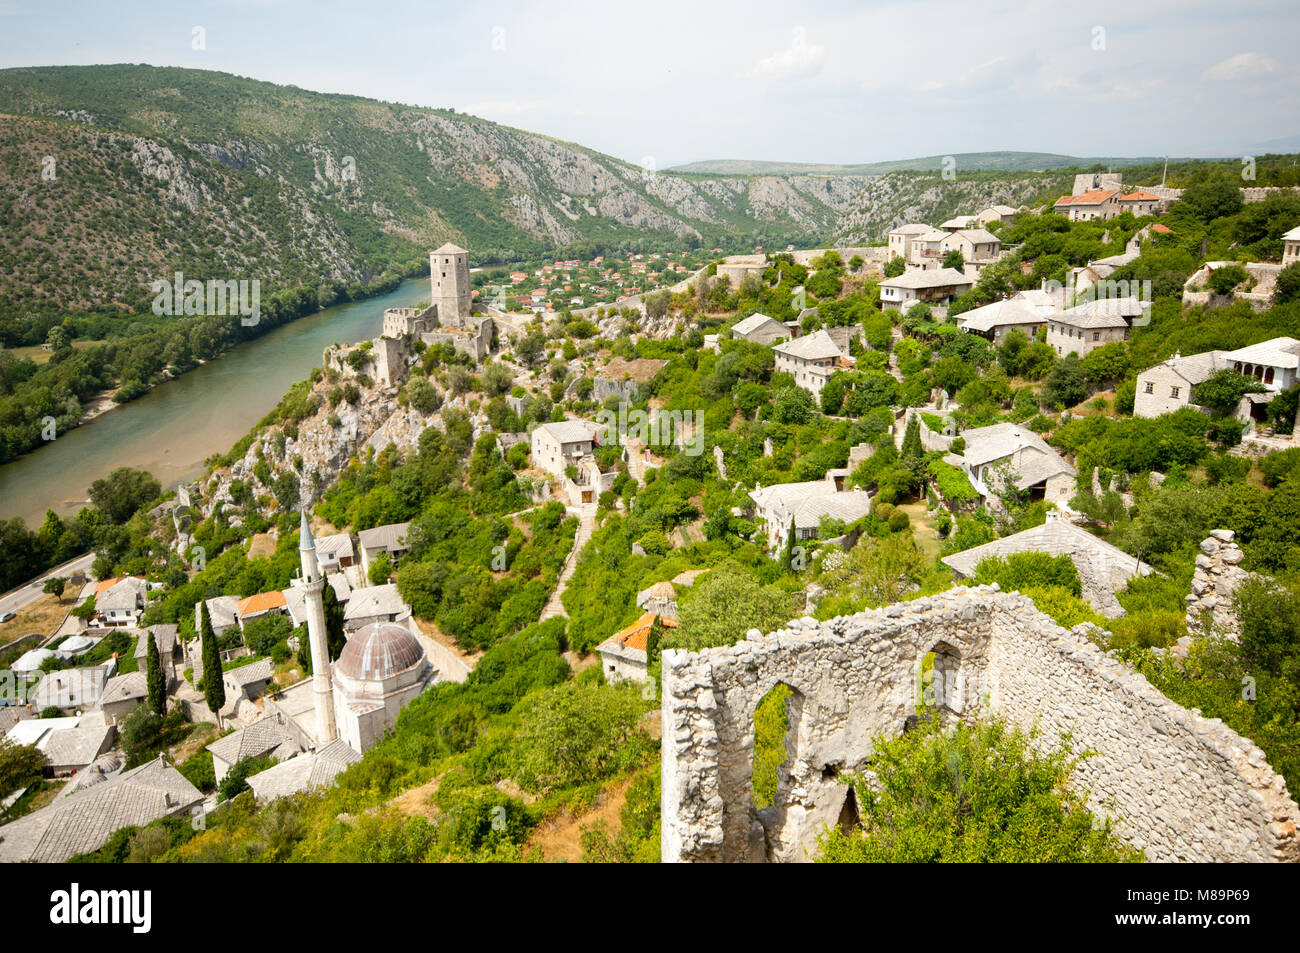 Old town of Pocitelj, Bosnia and Herzegovina - Stock Image